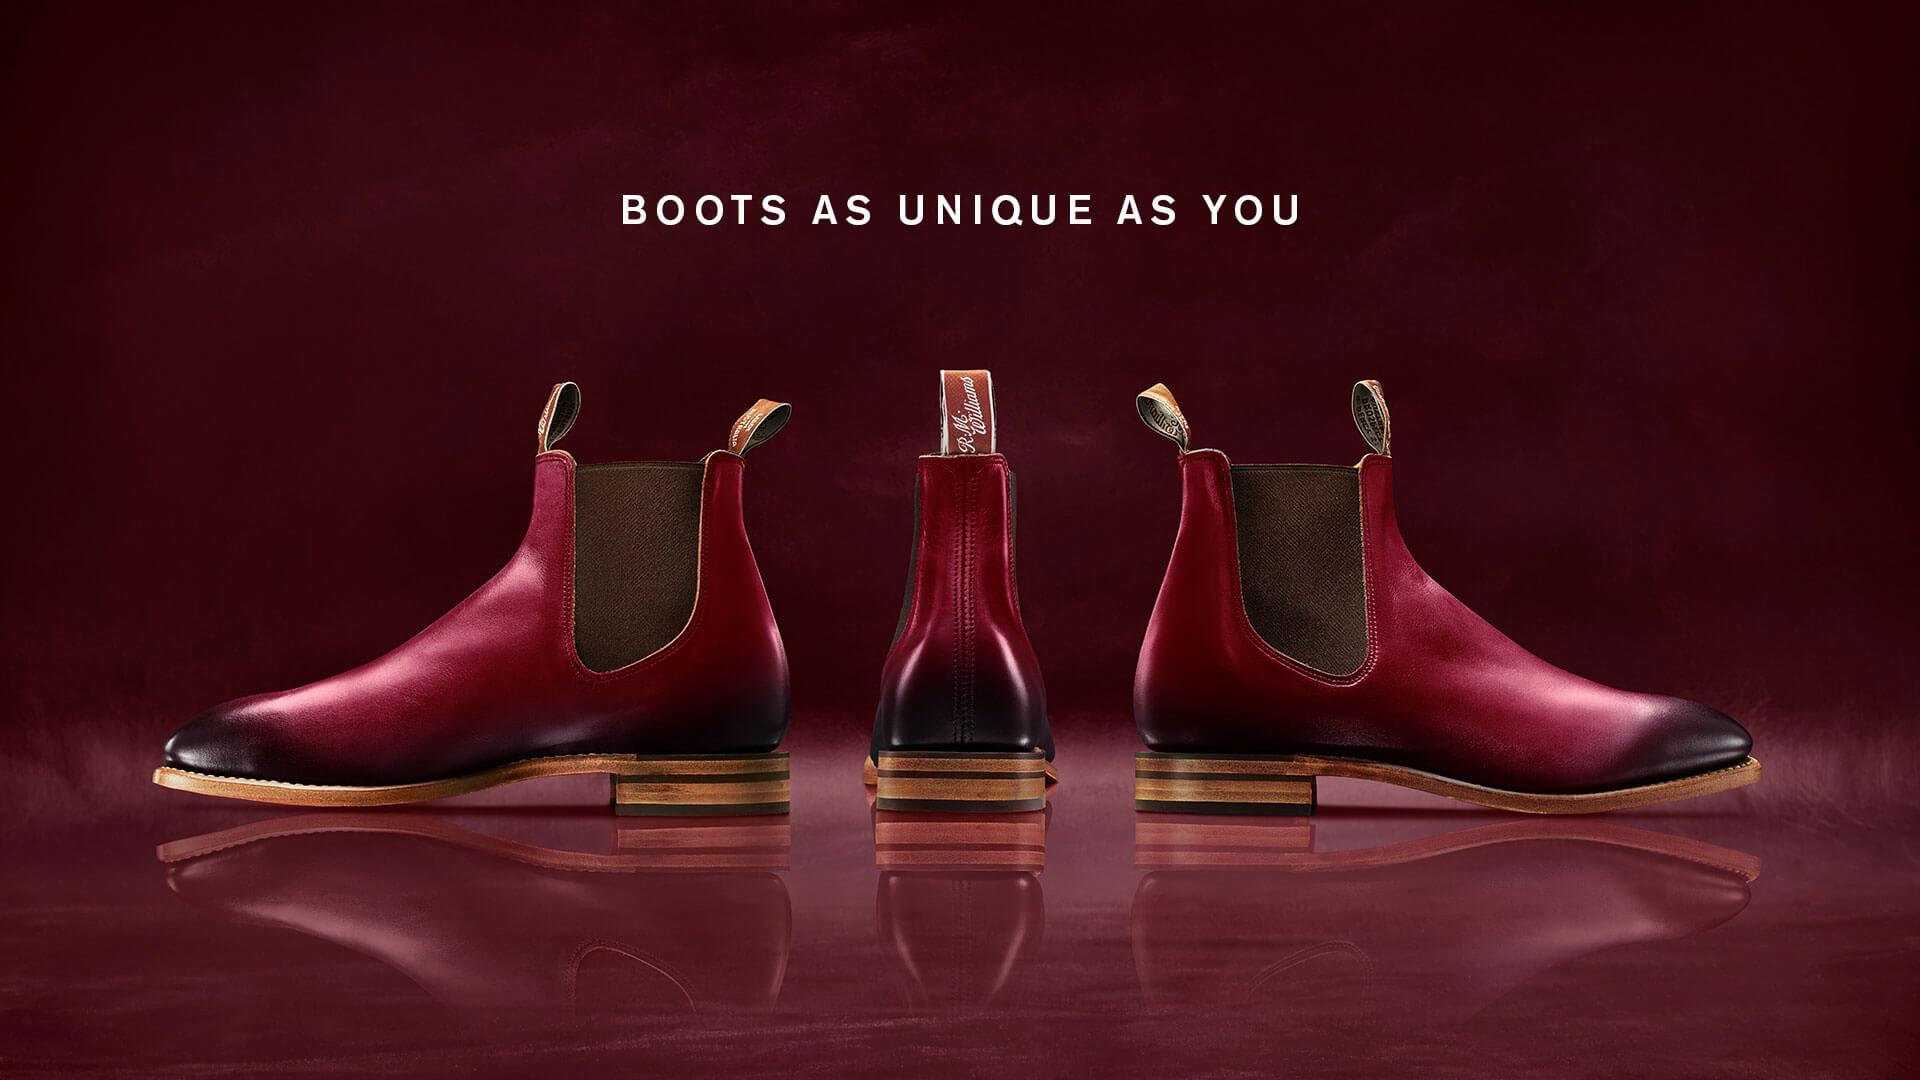 Boots as unique as you